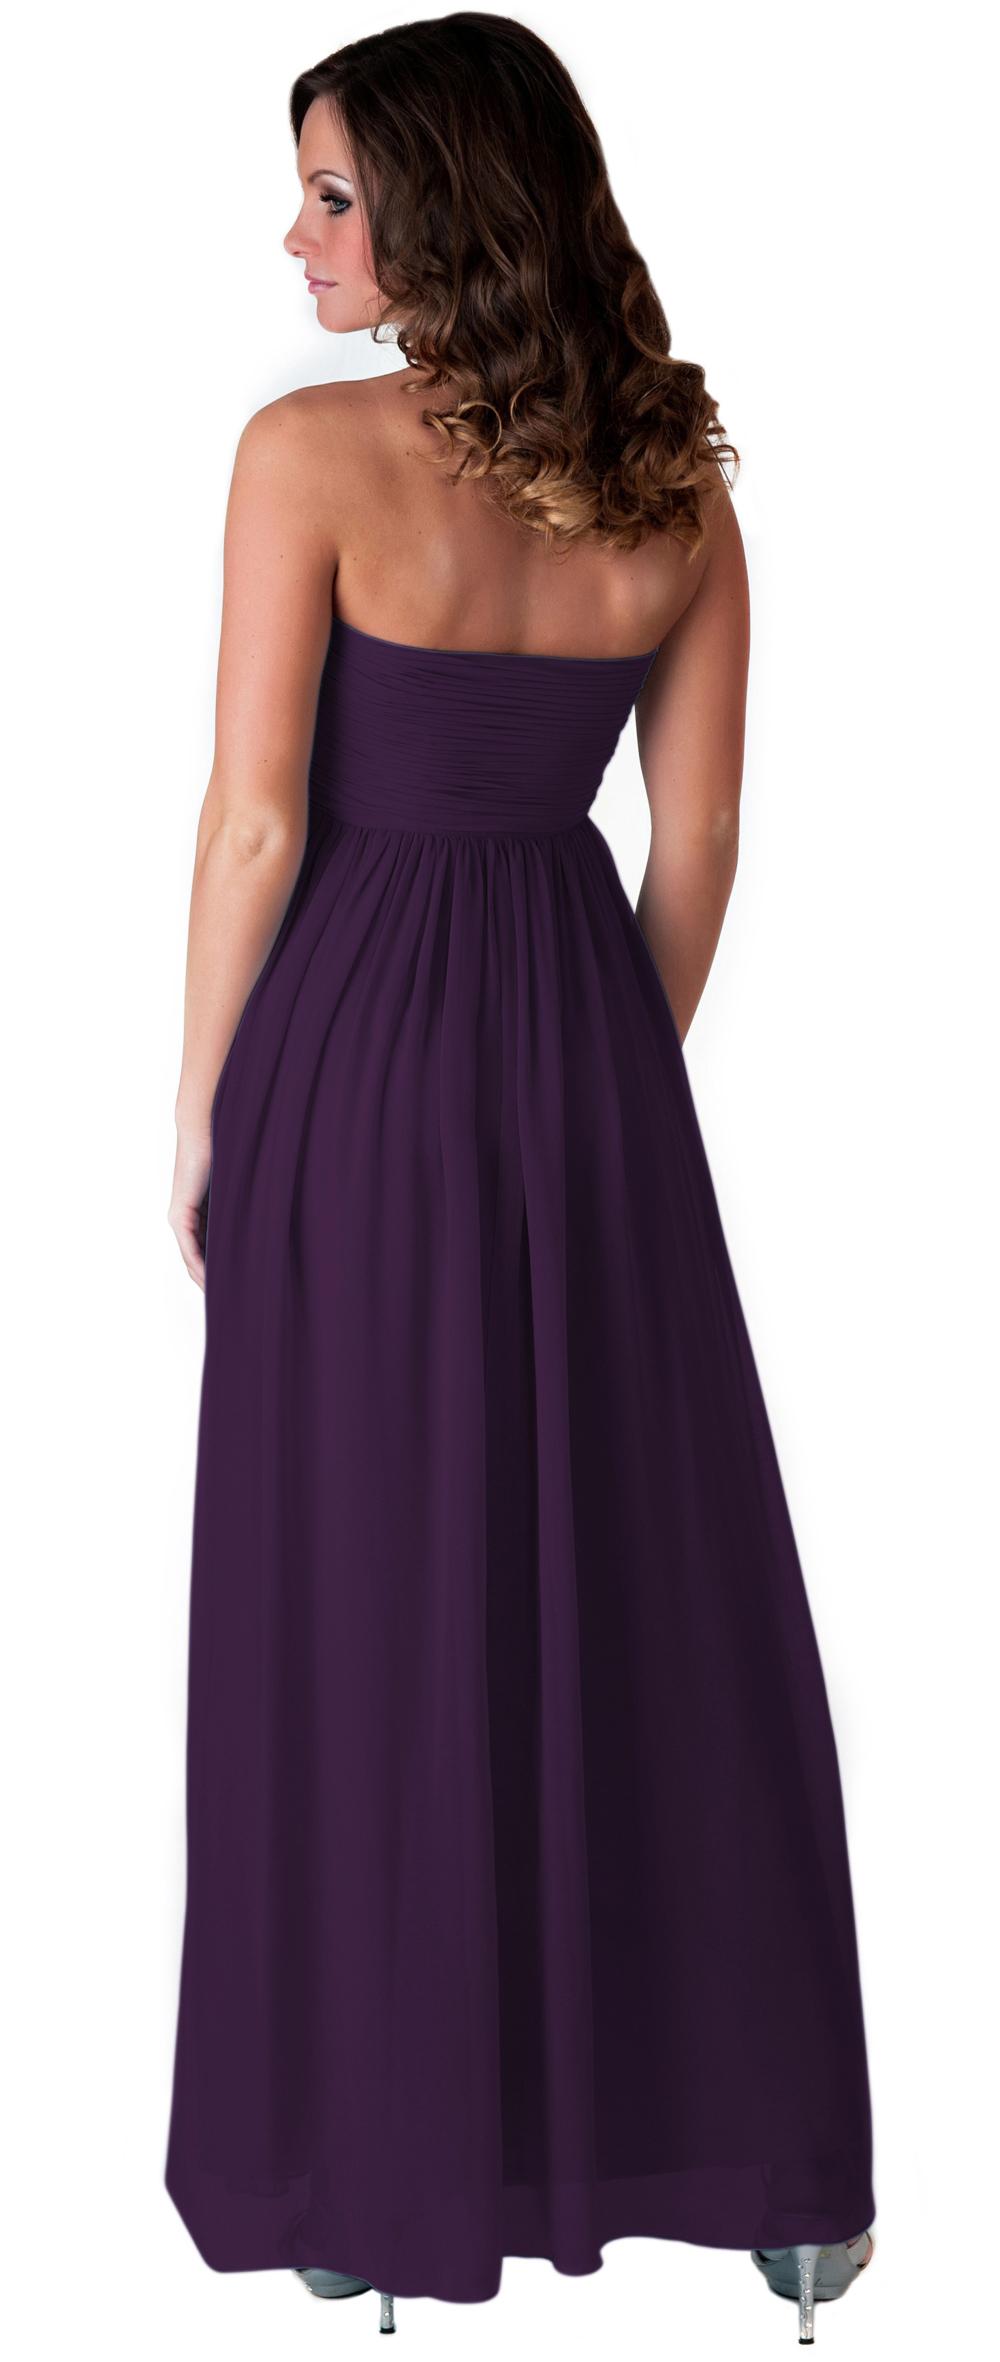 Vestido-Formal-Largo-Noche-Vestido-Dama-De-Honor-Boda-Fiesta-Celebracion-0-18